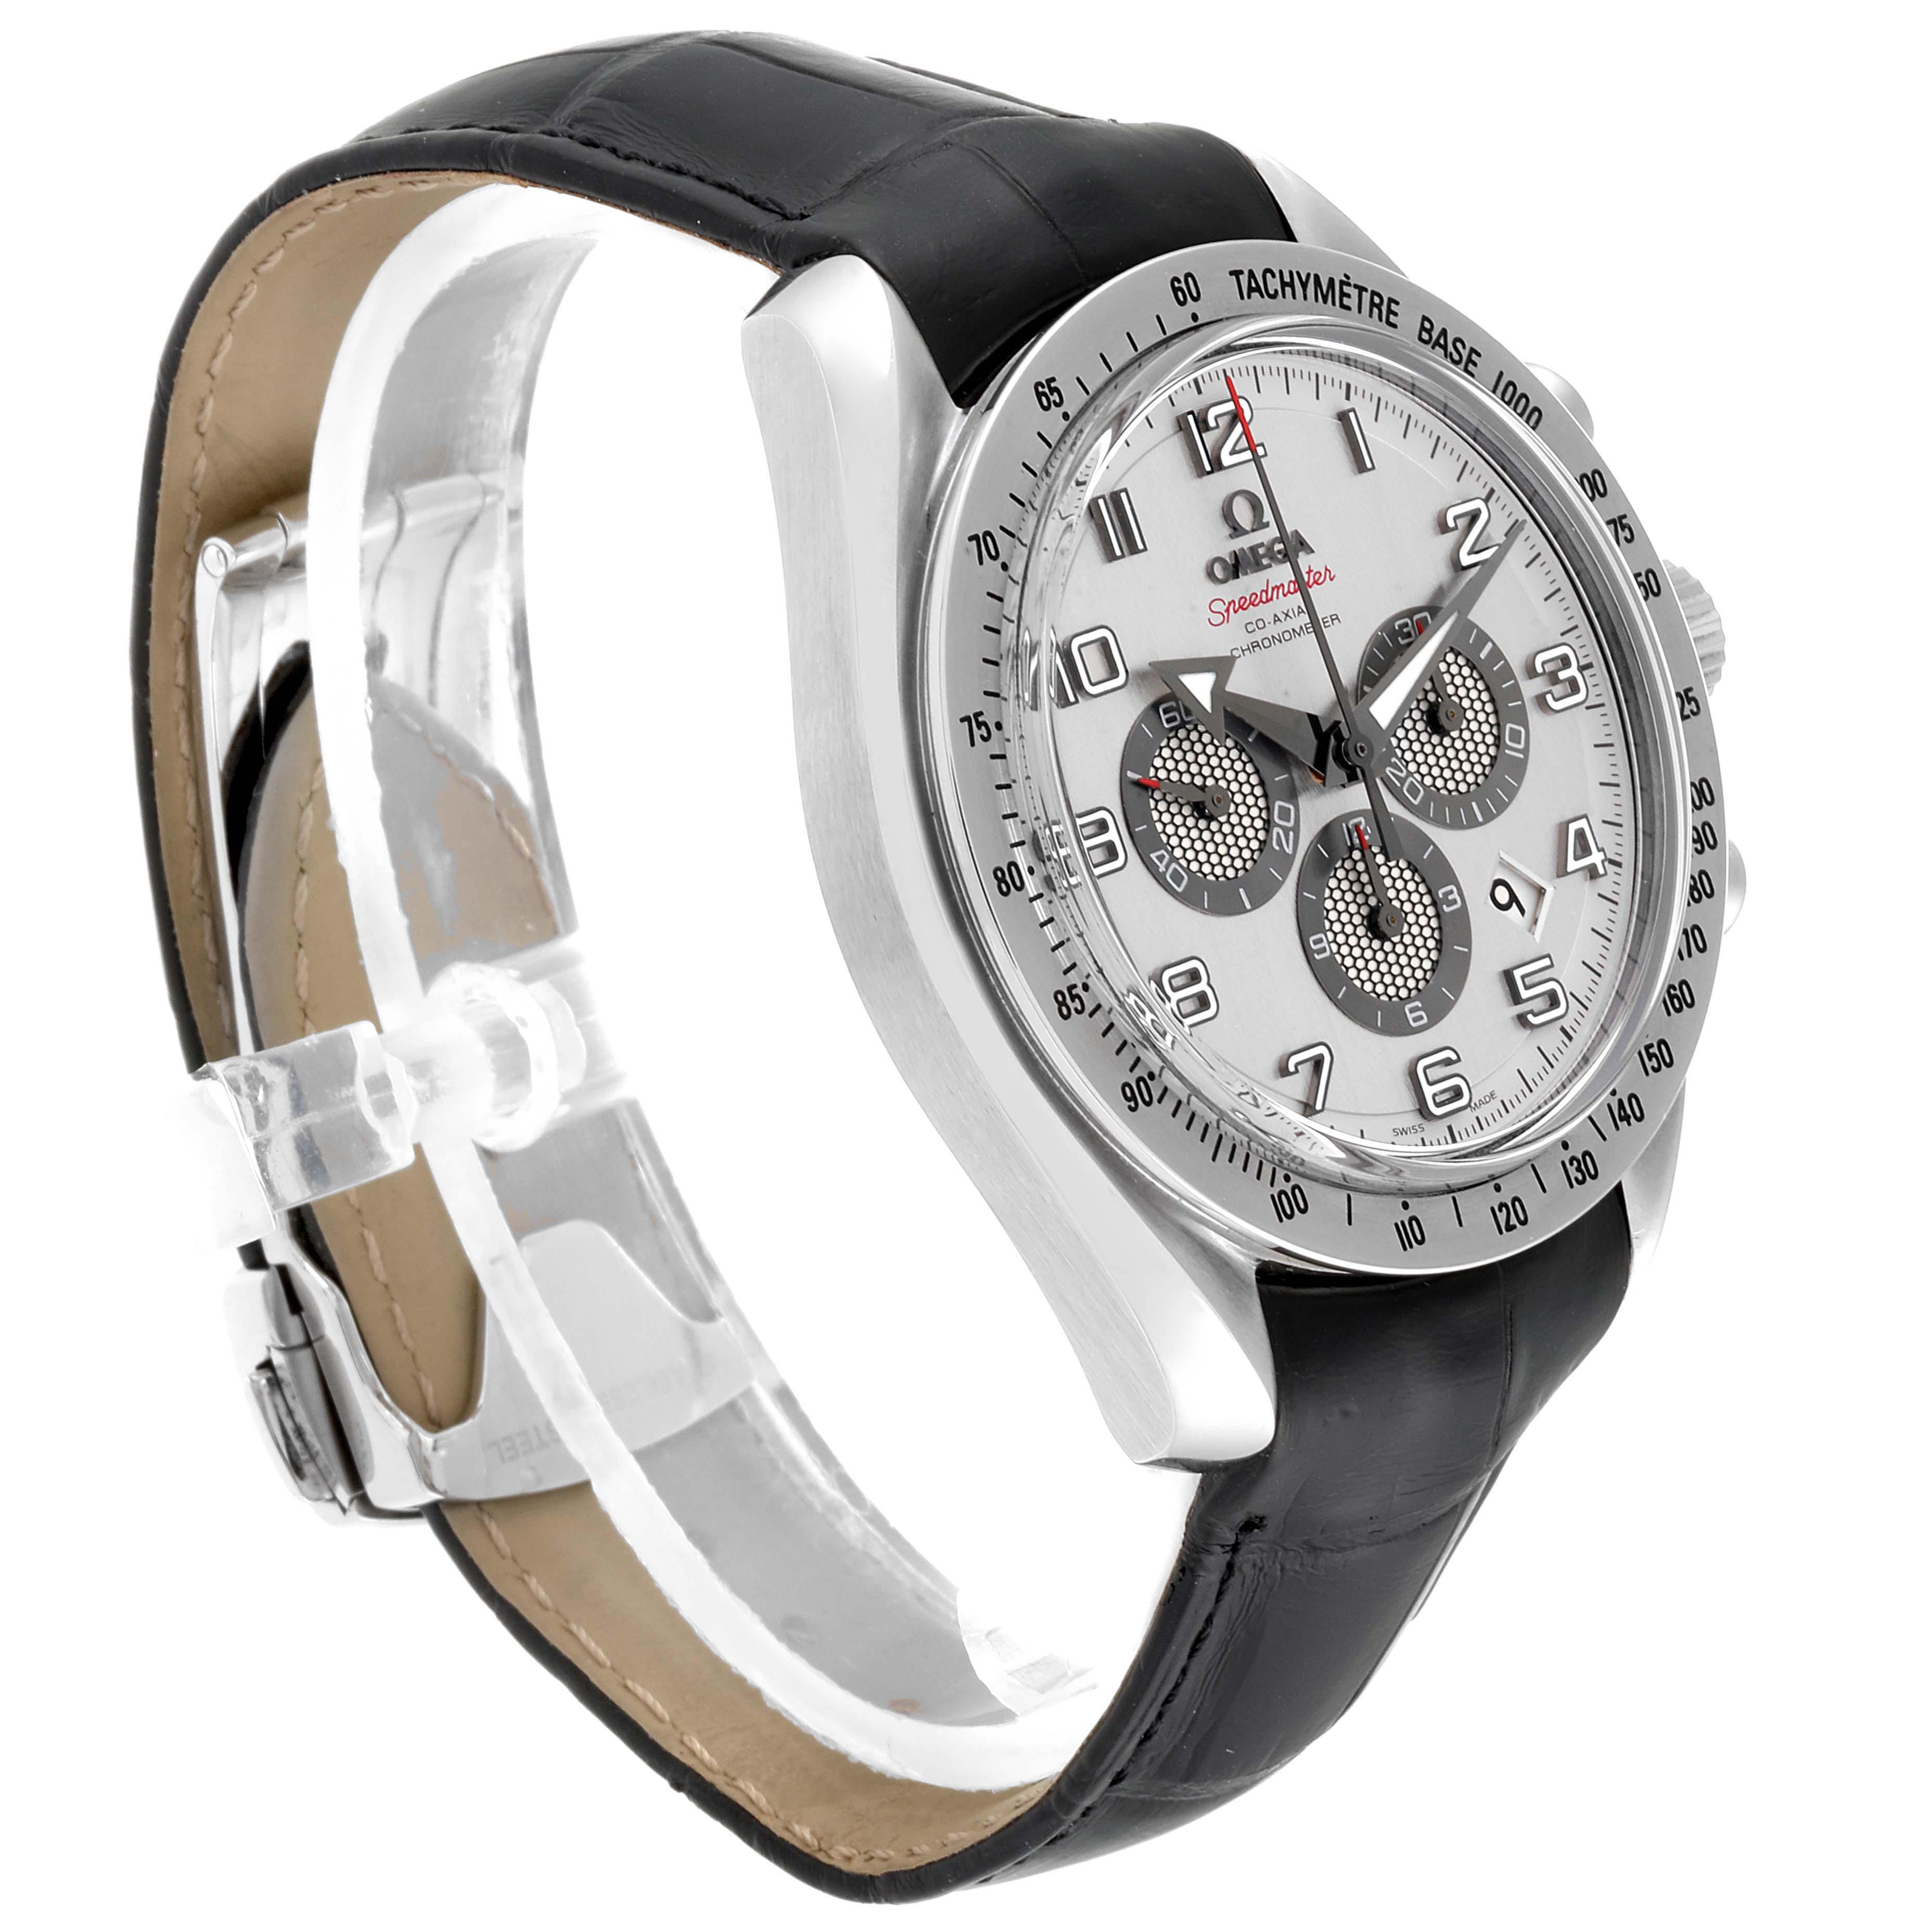 Omega Speedmaster Broad Arrow Silver Dial Watch 321.13.44.50.02.001 SwissWatchExpo